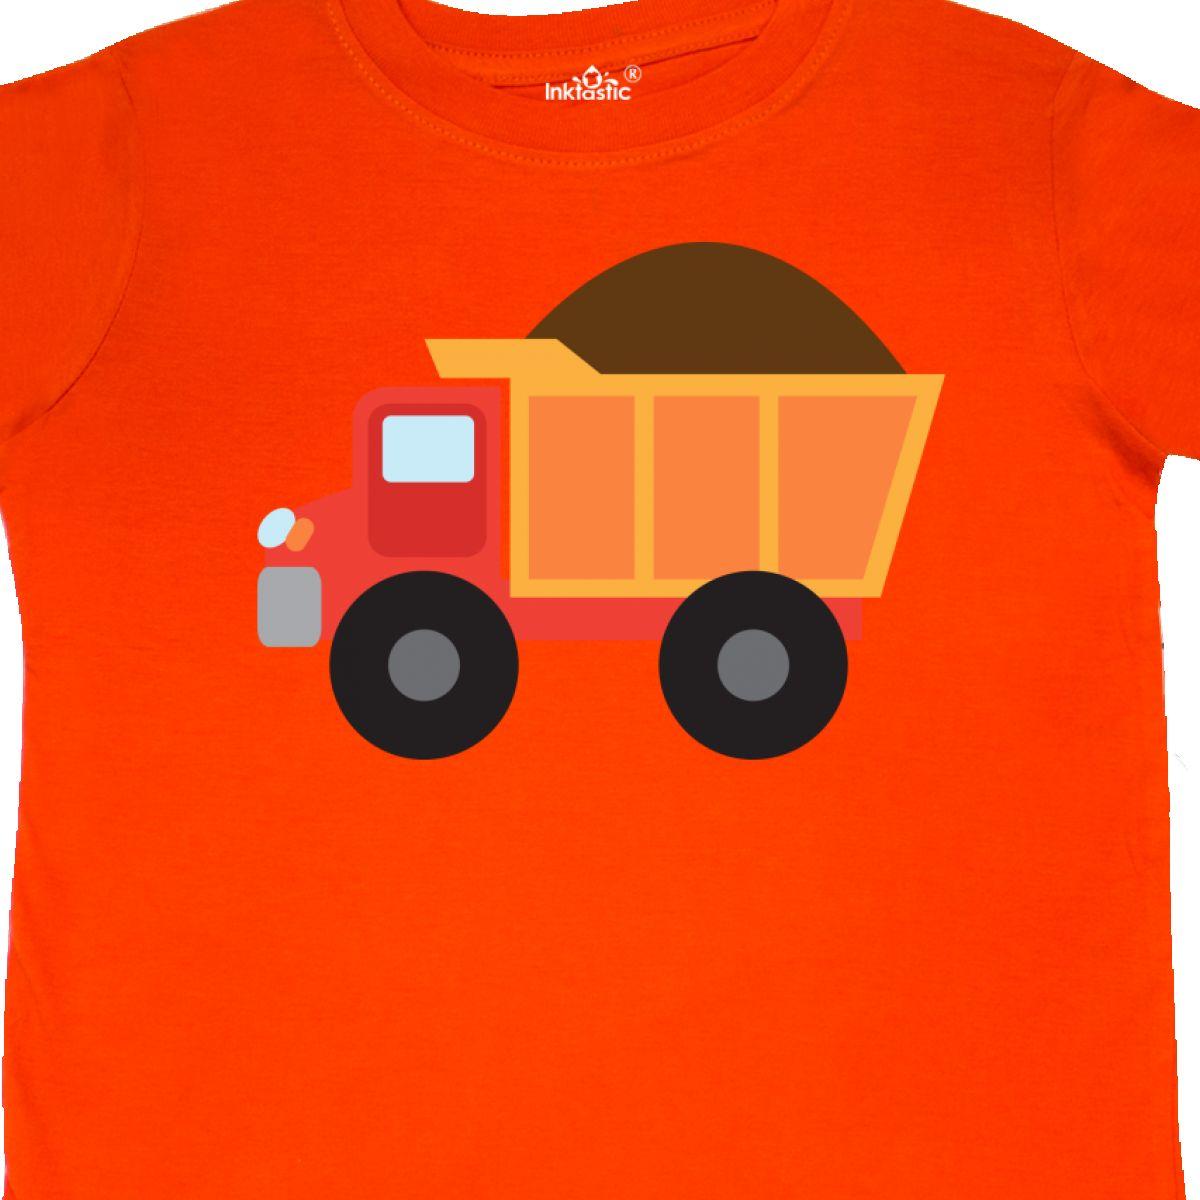 Inktastic-Work-Truck-Construction-Vehicle-Toddler-T-Shirt-Trucks-Vehicles-Cute thumbnail 24